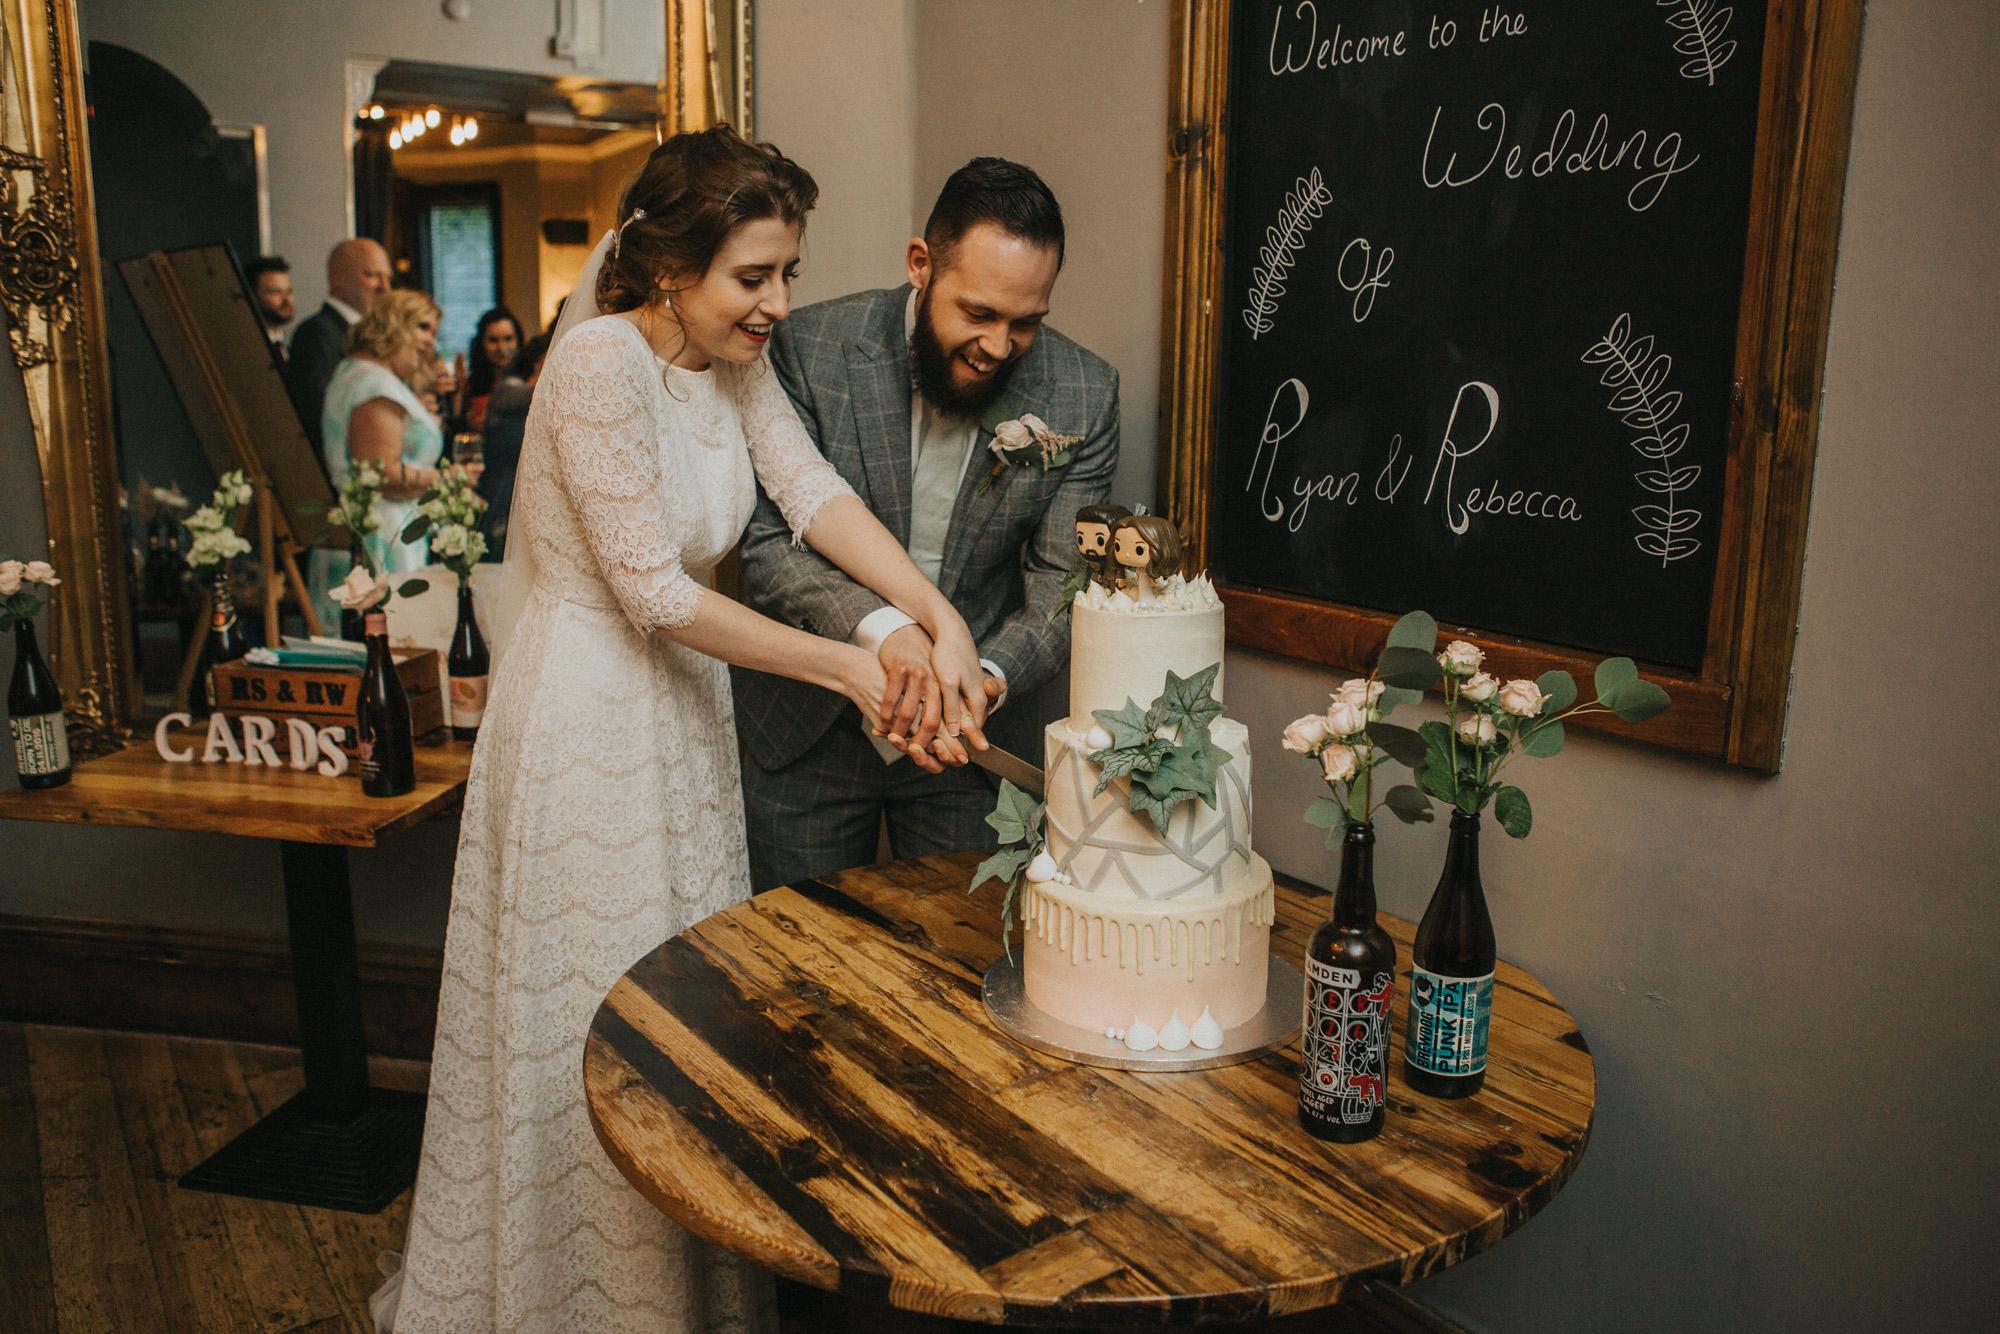 Kate-Beaumont-Lace-Flared-Dahlia-Gown-Leeds-Wedding-Bloom-Weddings-58.jpg